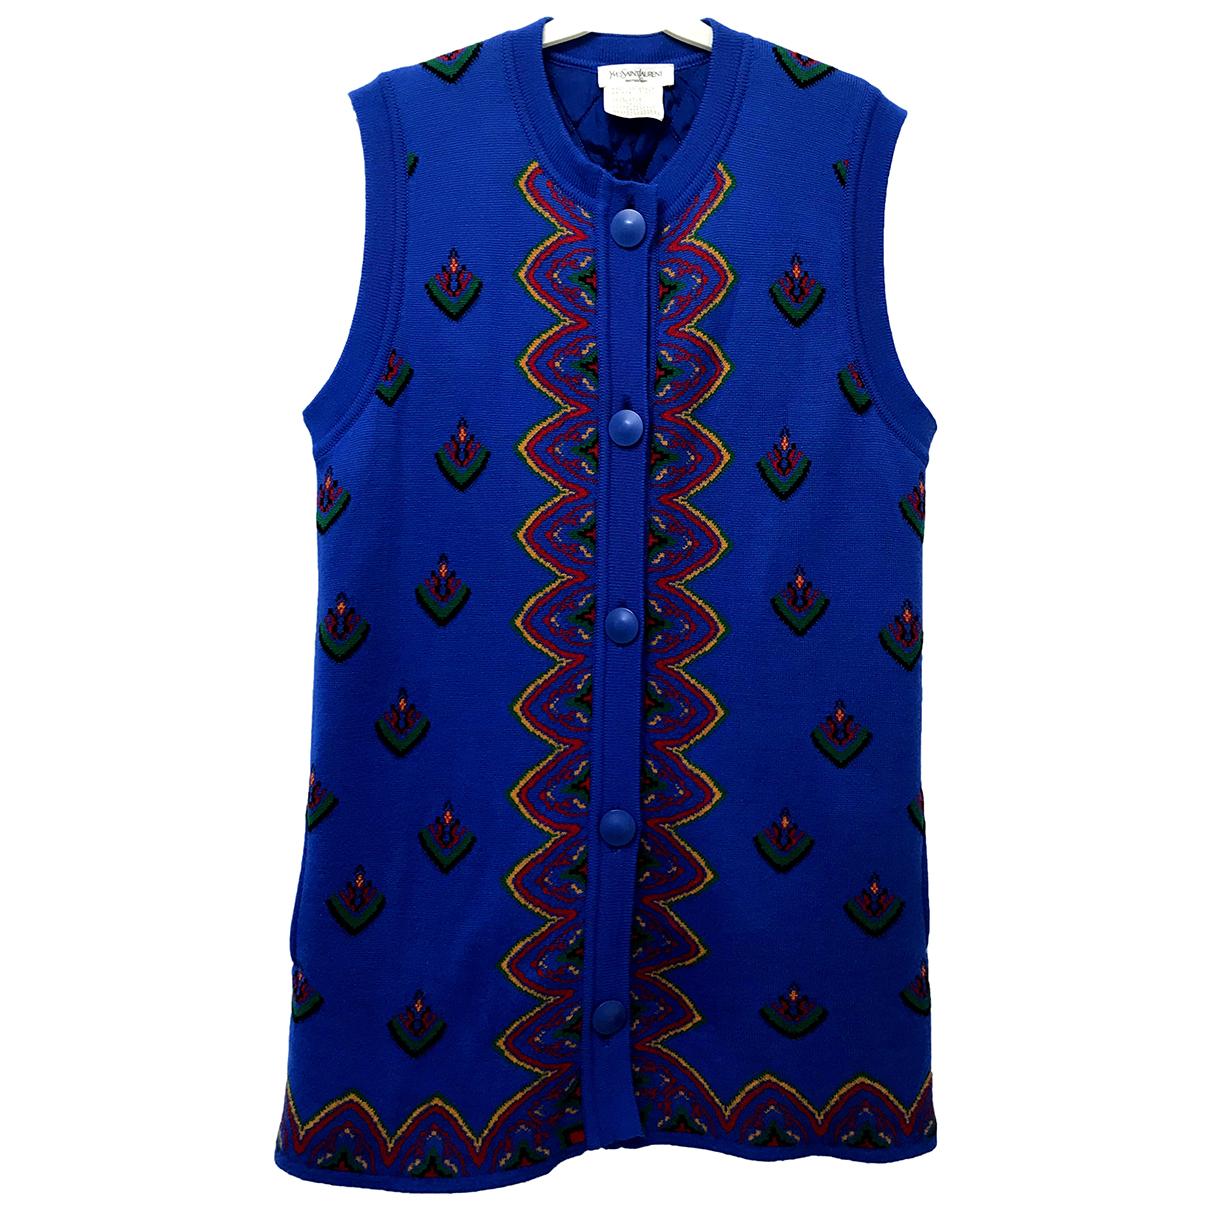 Yves Saint Laurent \N Blue Wool jacket for Women M International